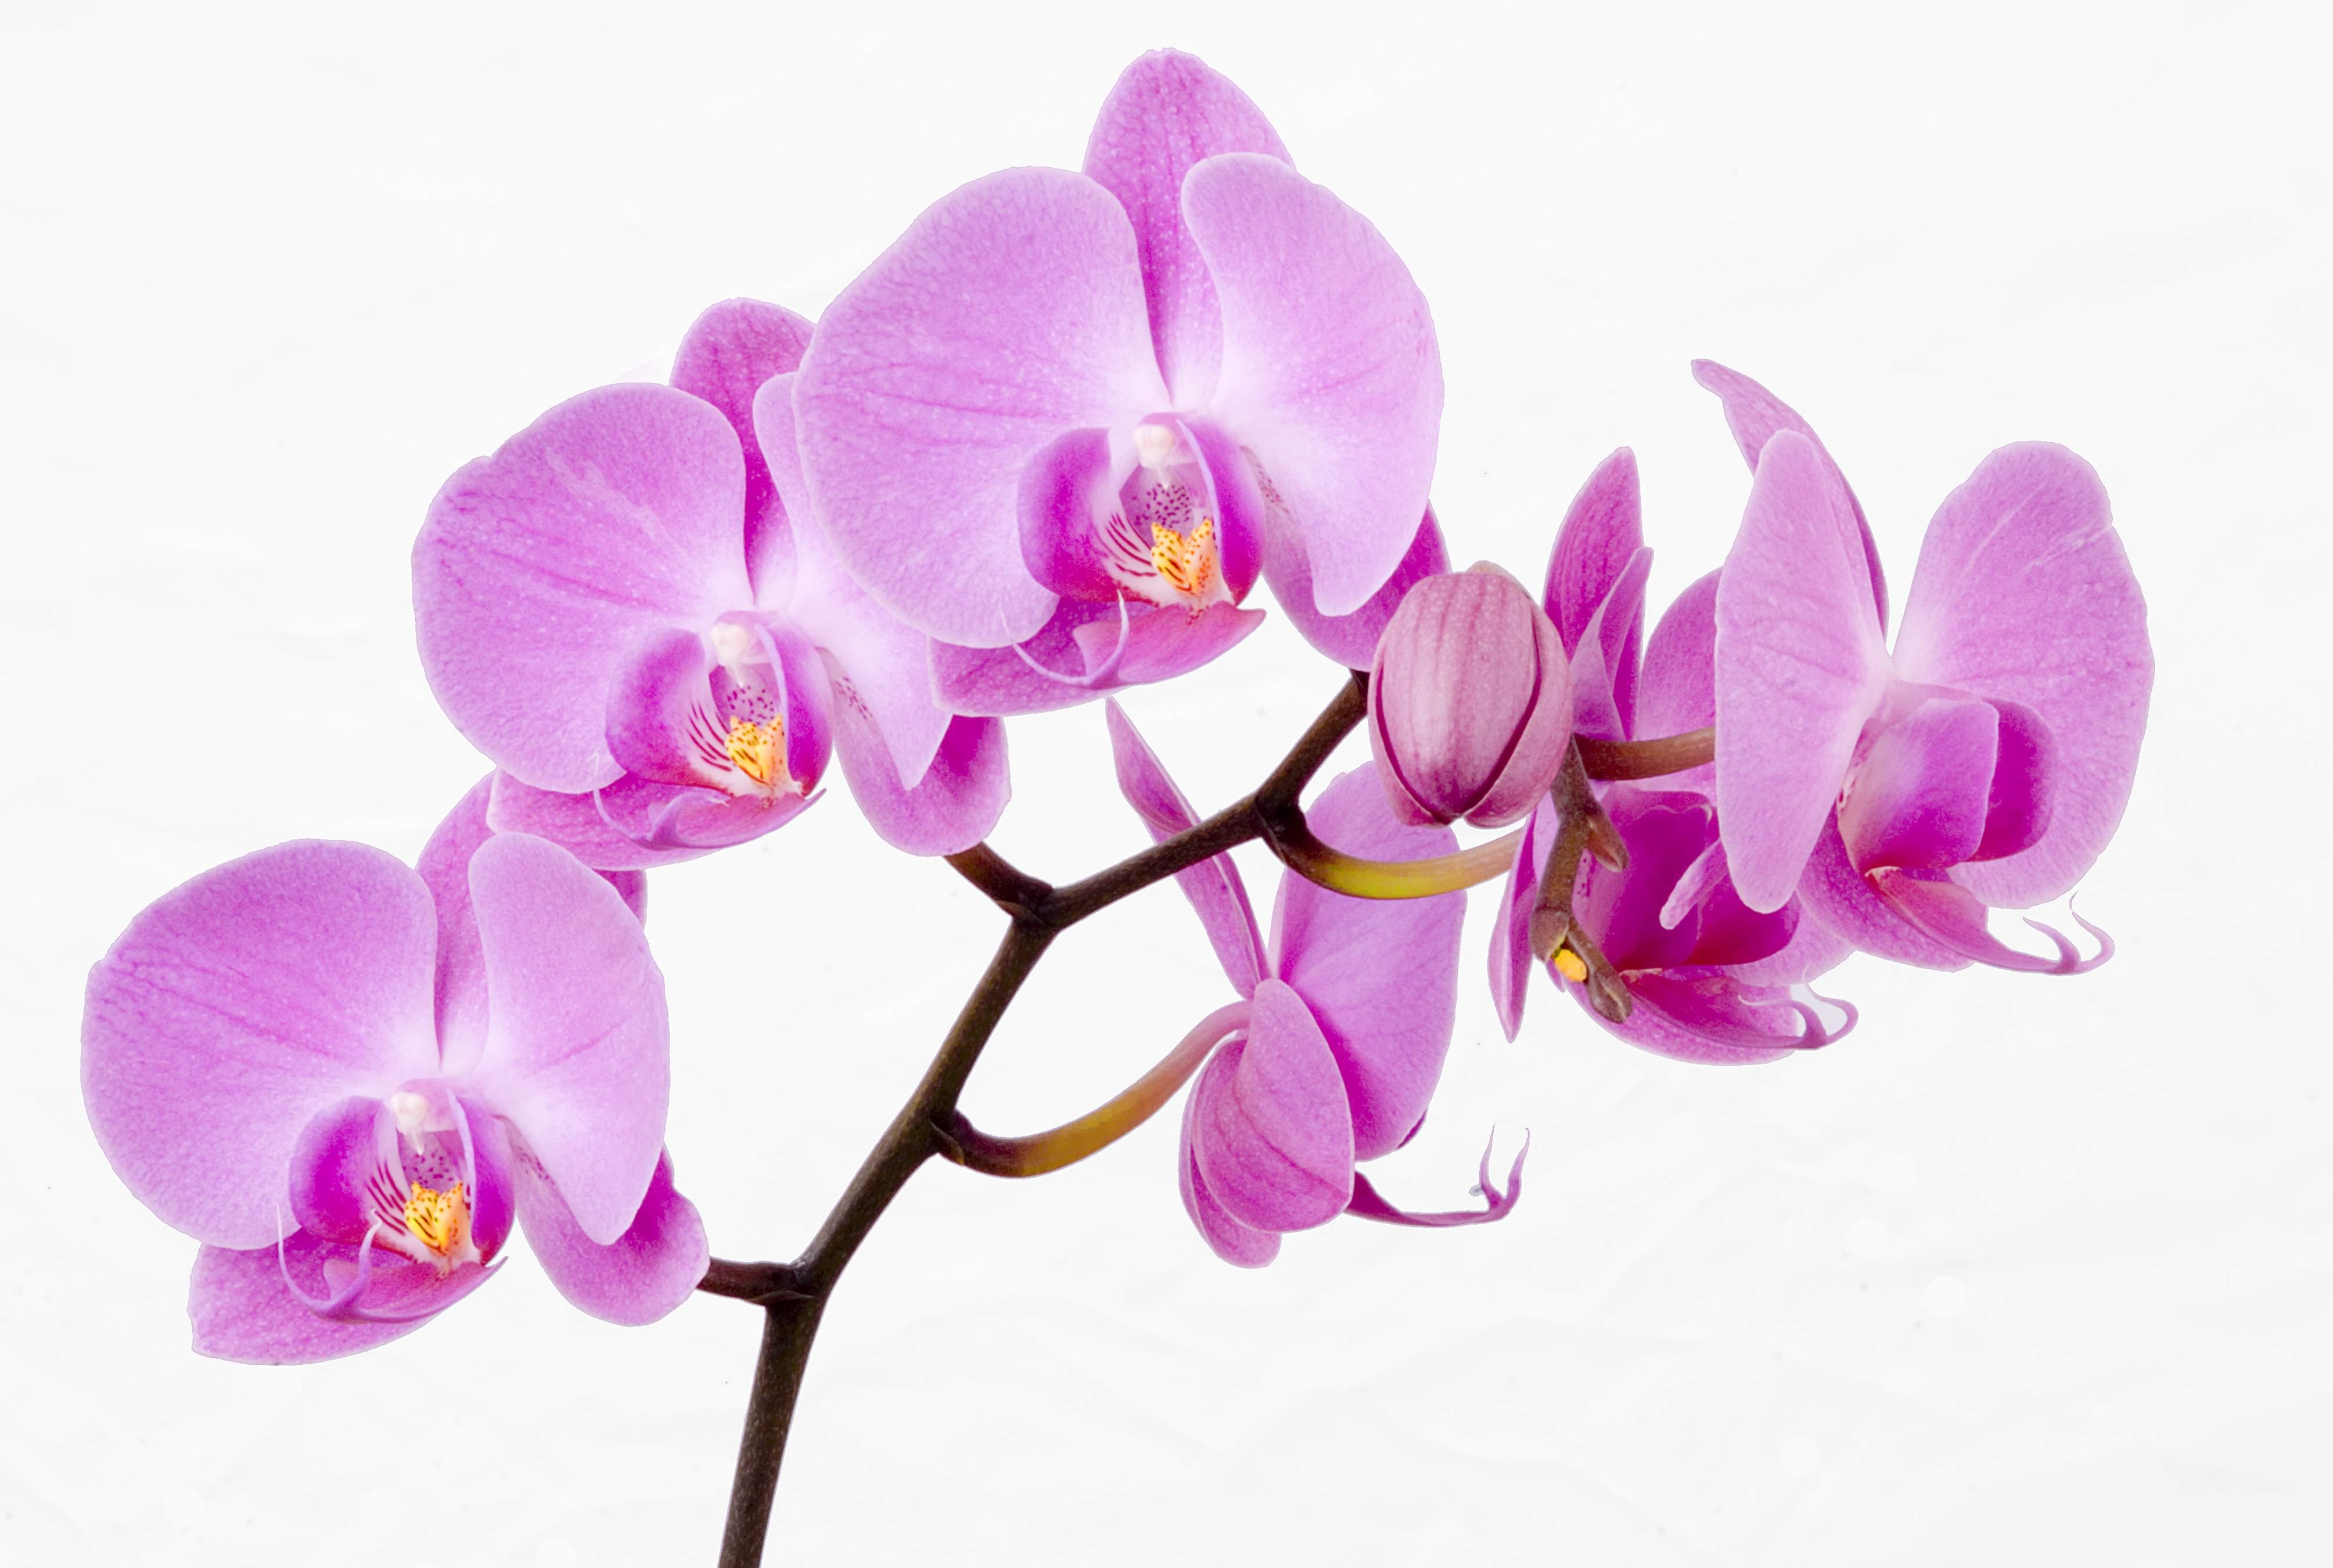 Como cuidar orquídeas para que florezcan